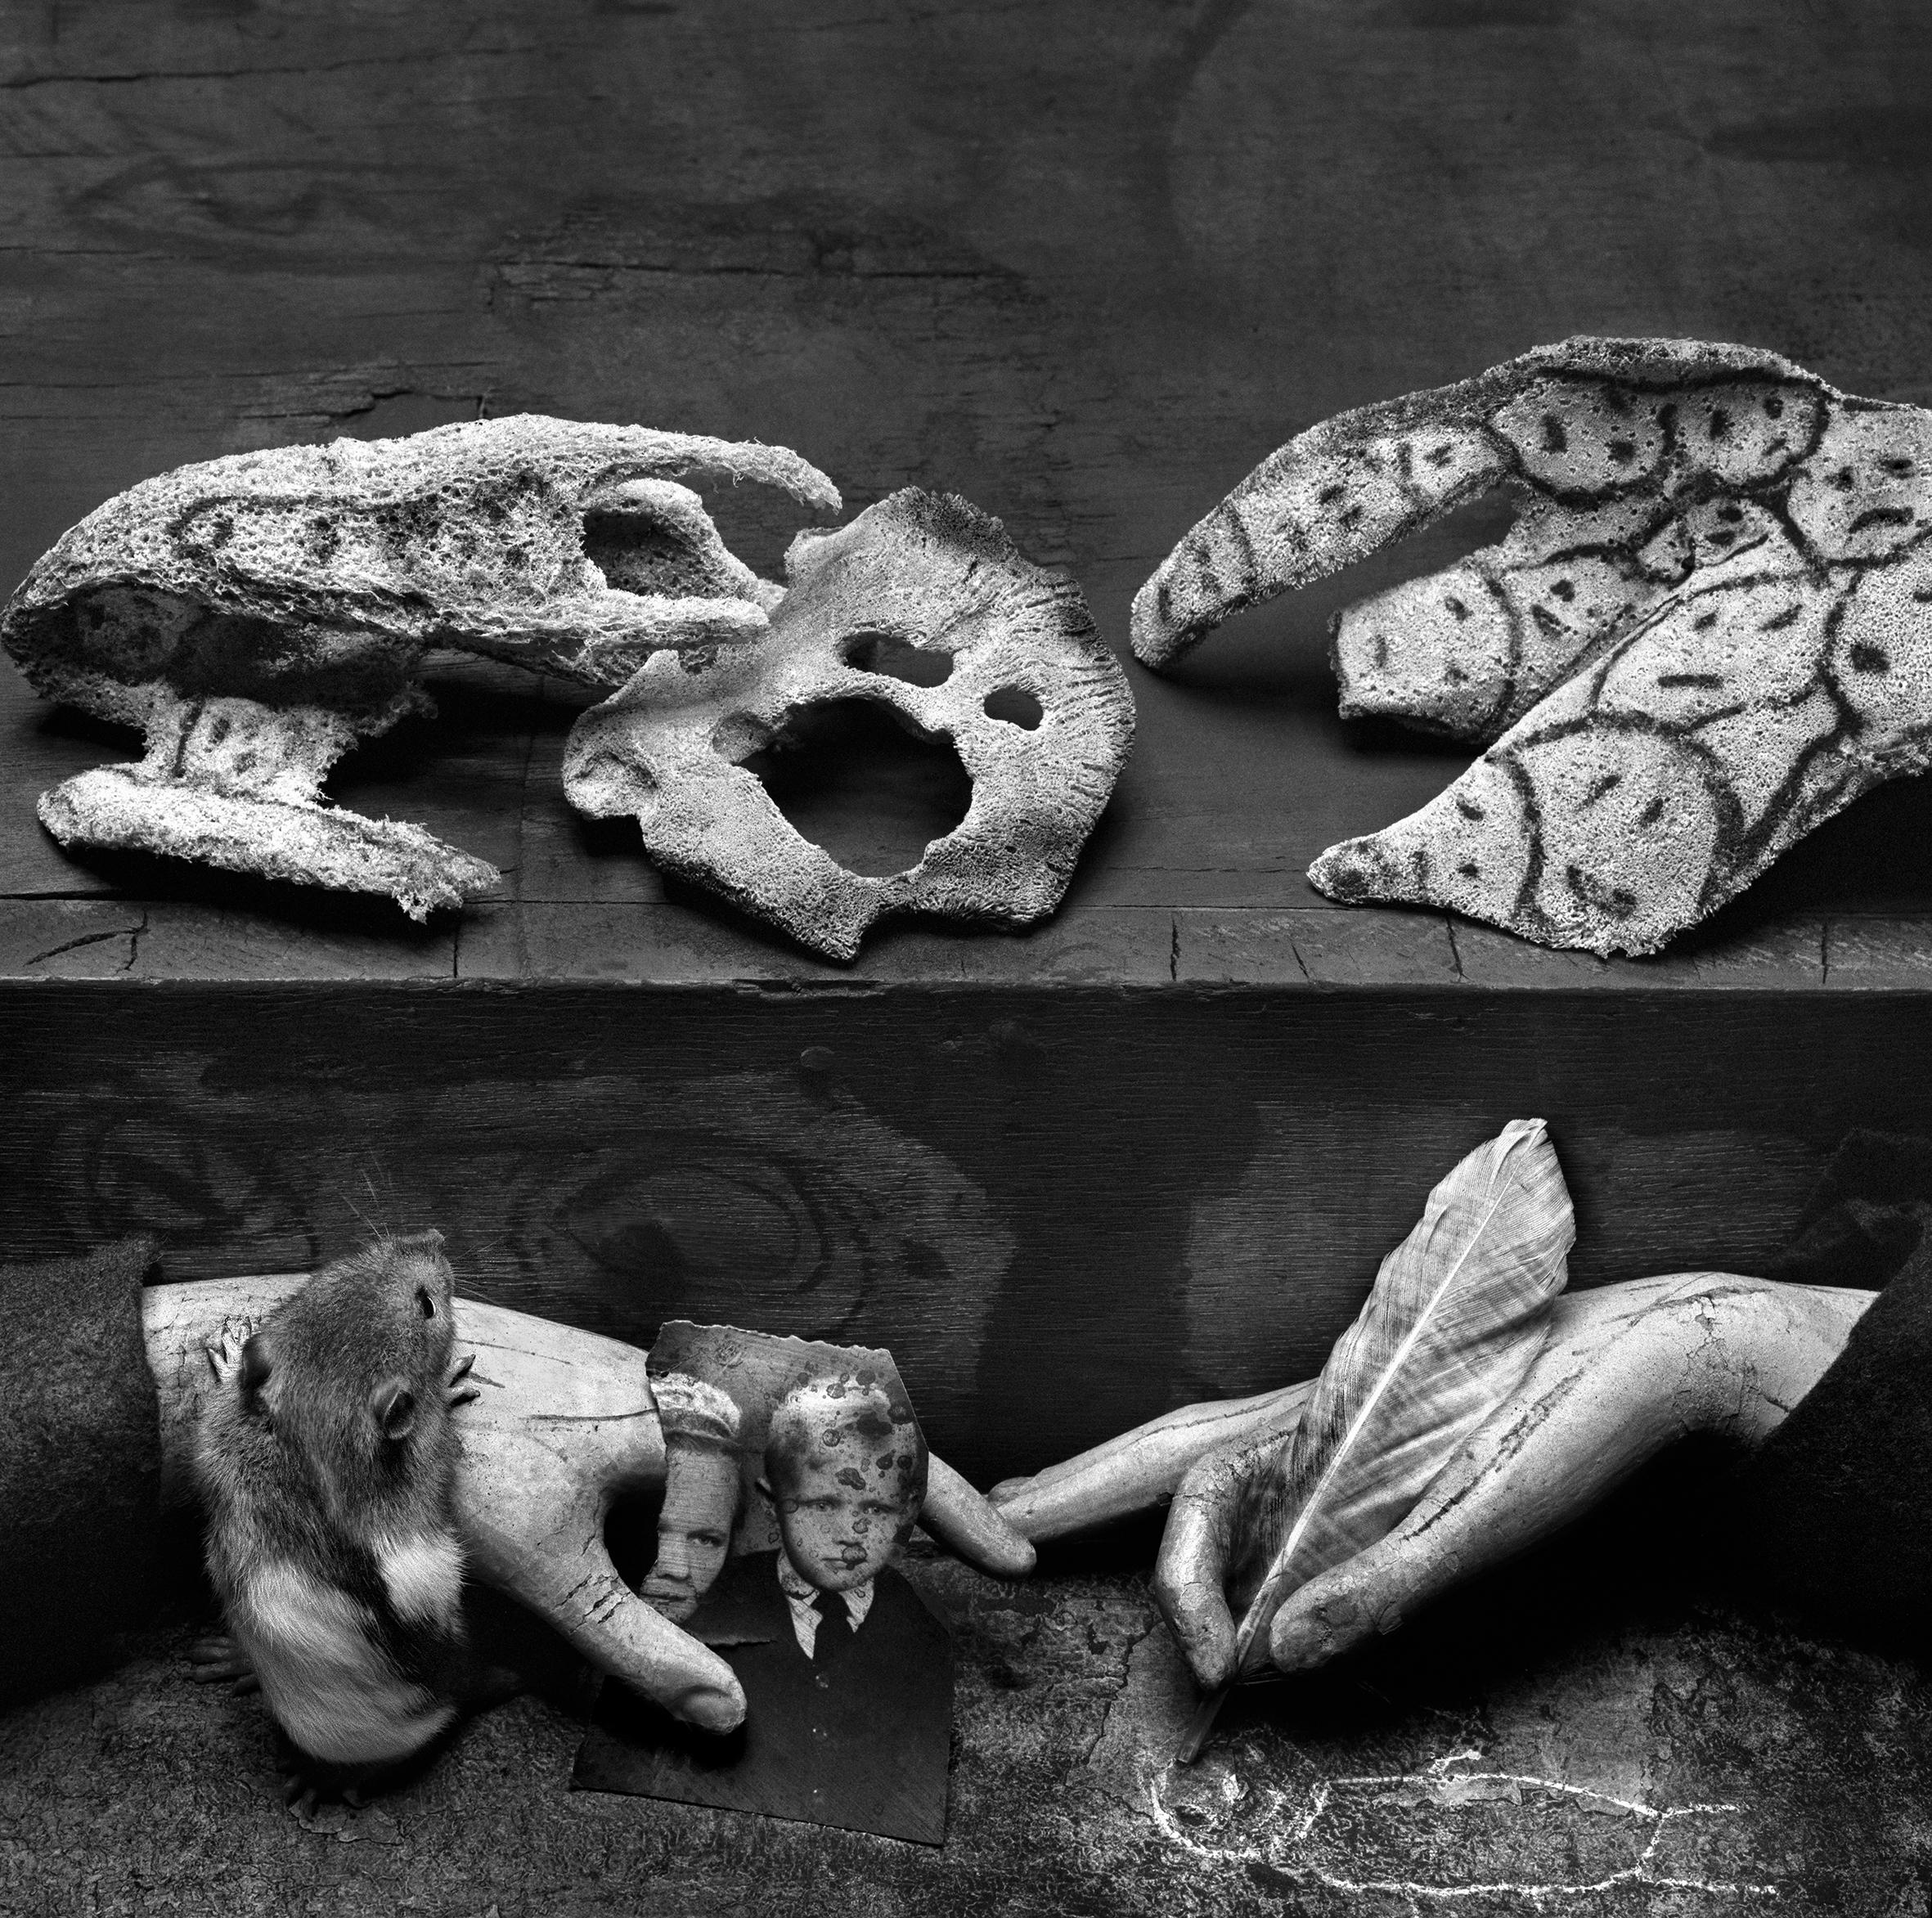 Complex Ambiguity, 2009, courtesy Roger Ballen